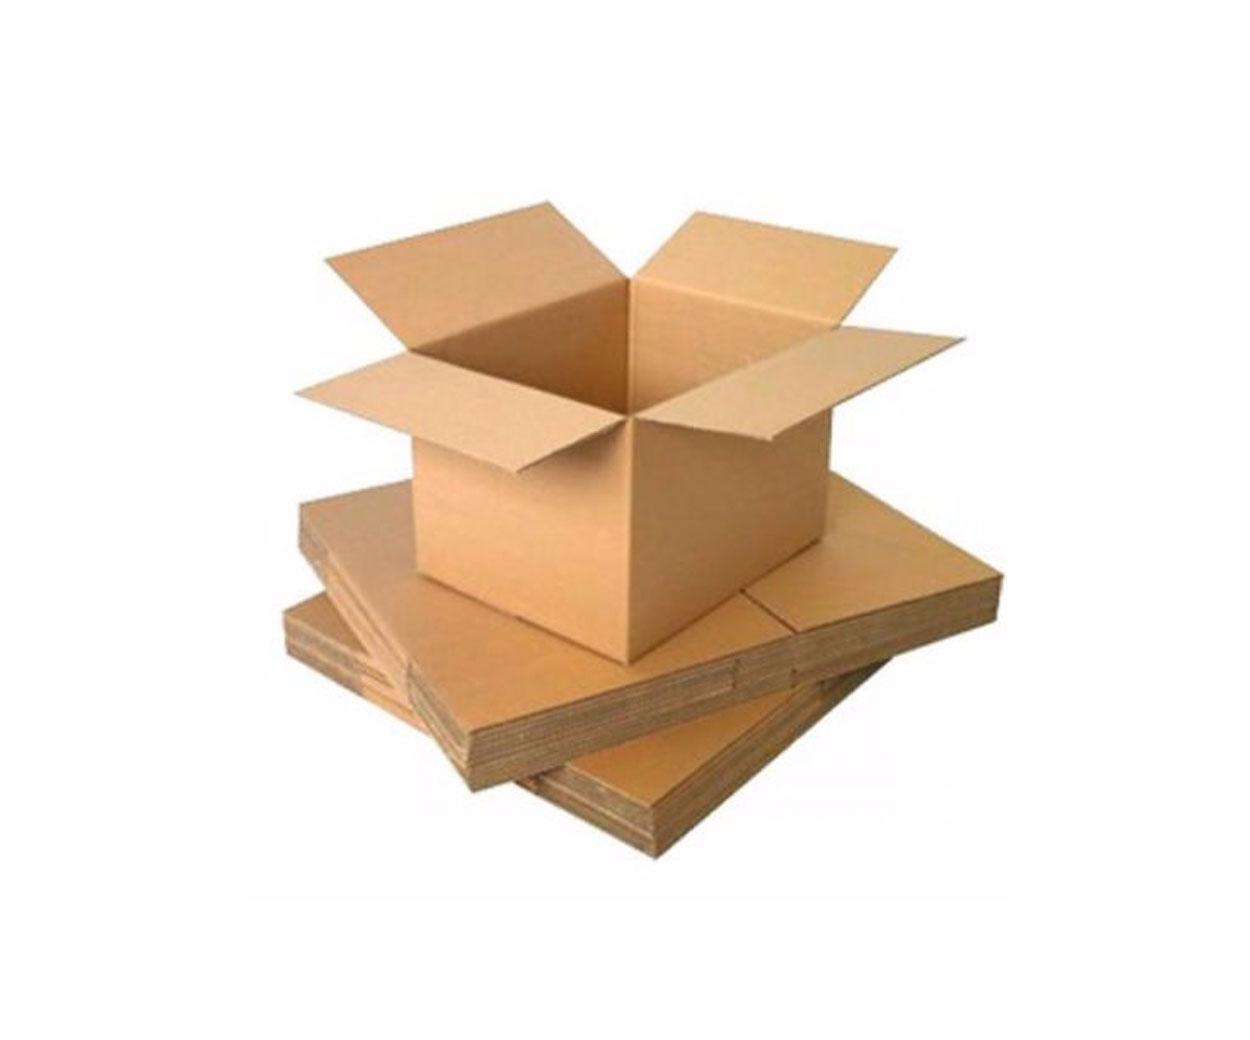 Lyreco Single Wall Cardboard Box - 381x248x127mm